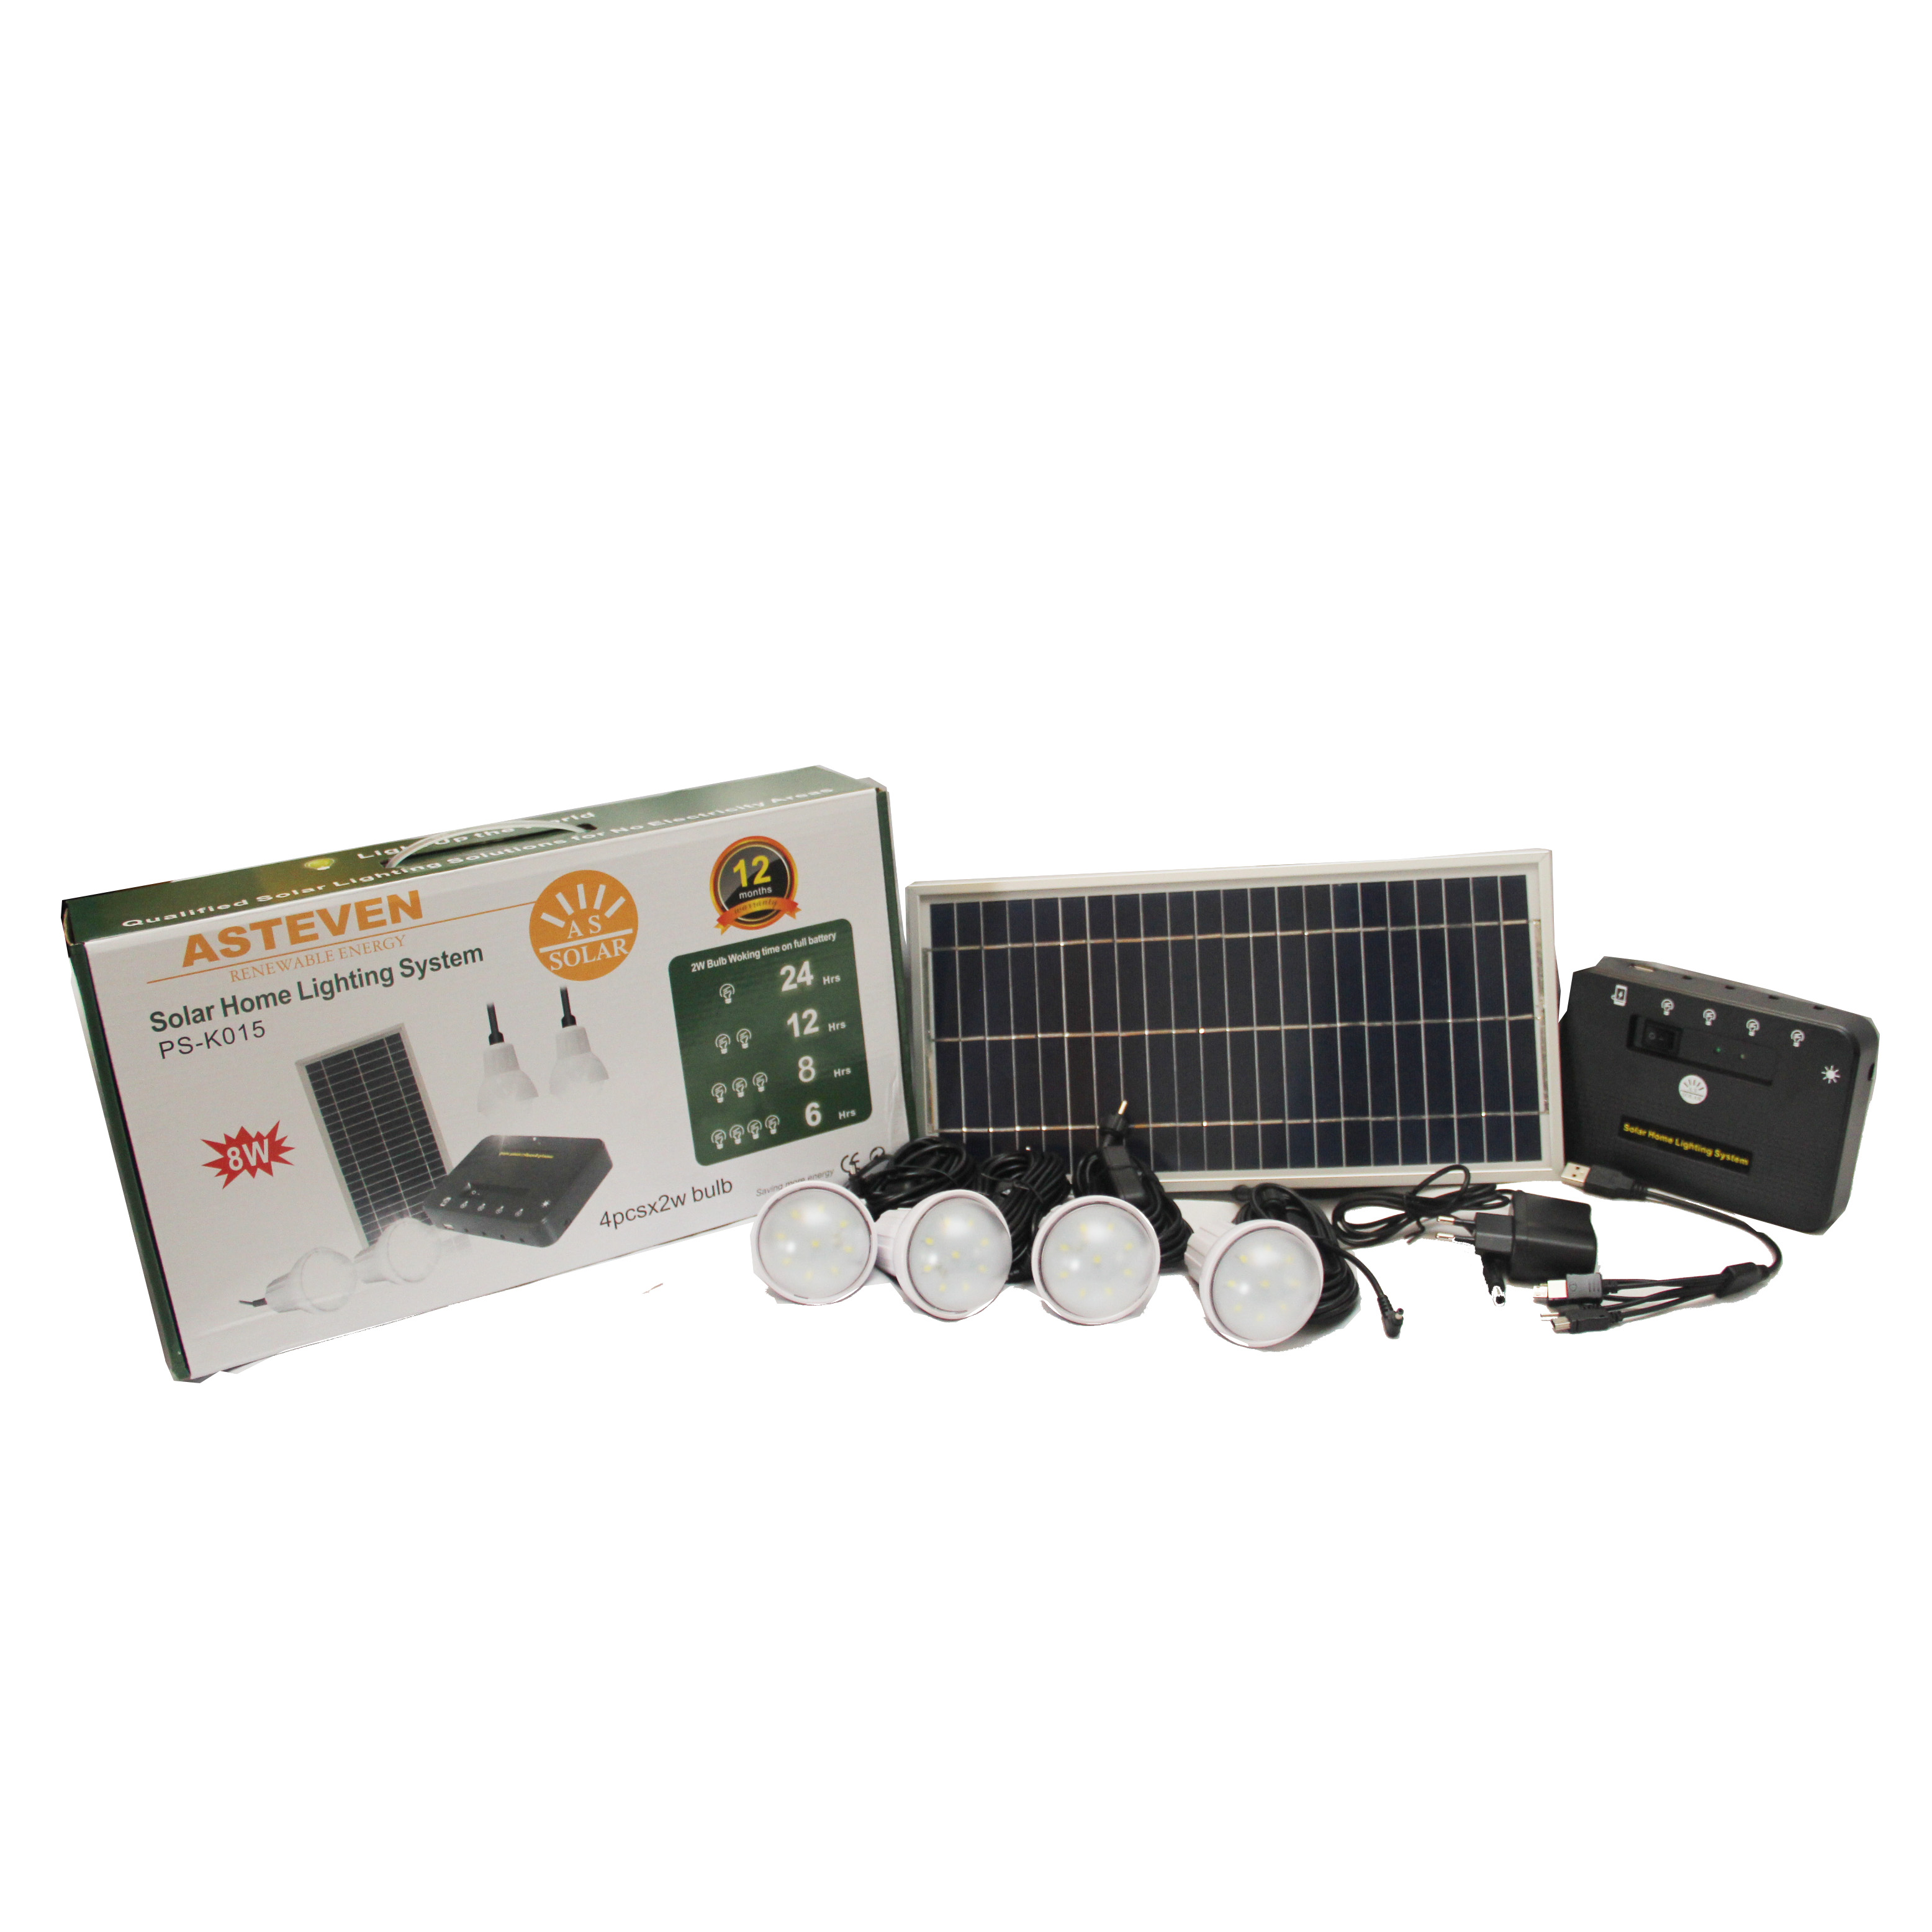 Solar Home Lighting System & Solar Mobile Phone Charging | ASHDAM SOLAR